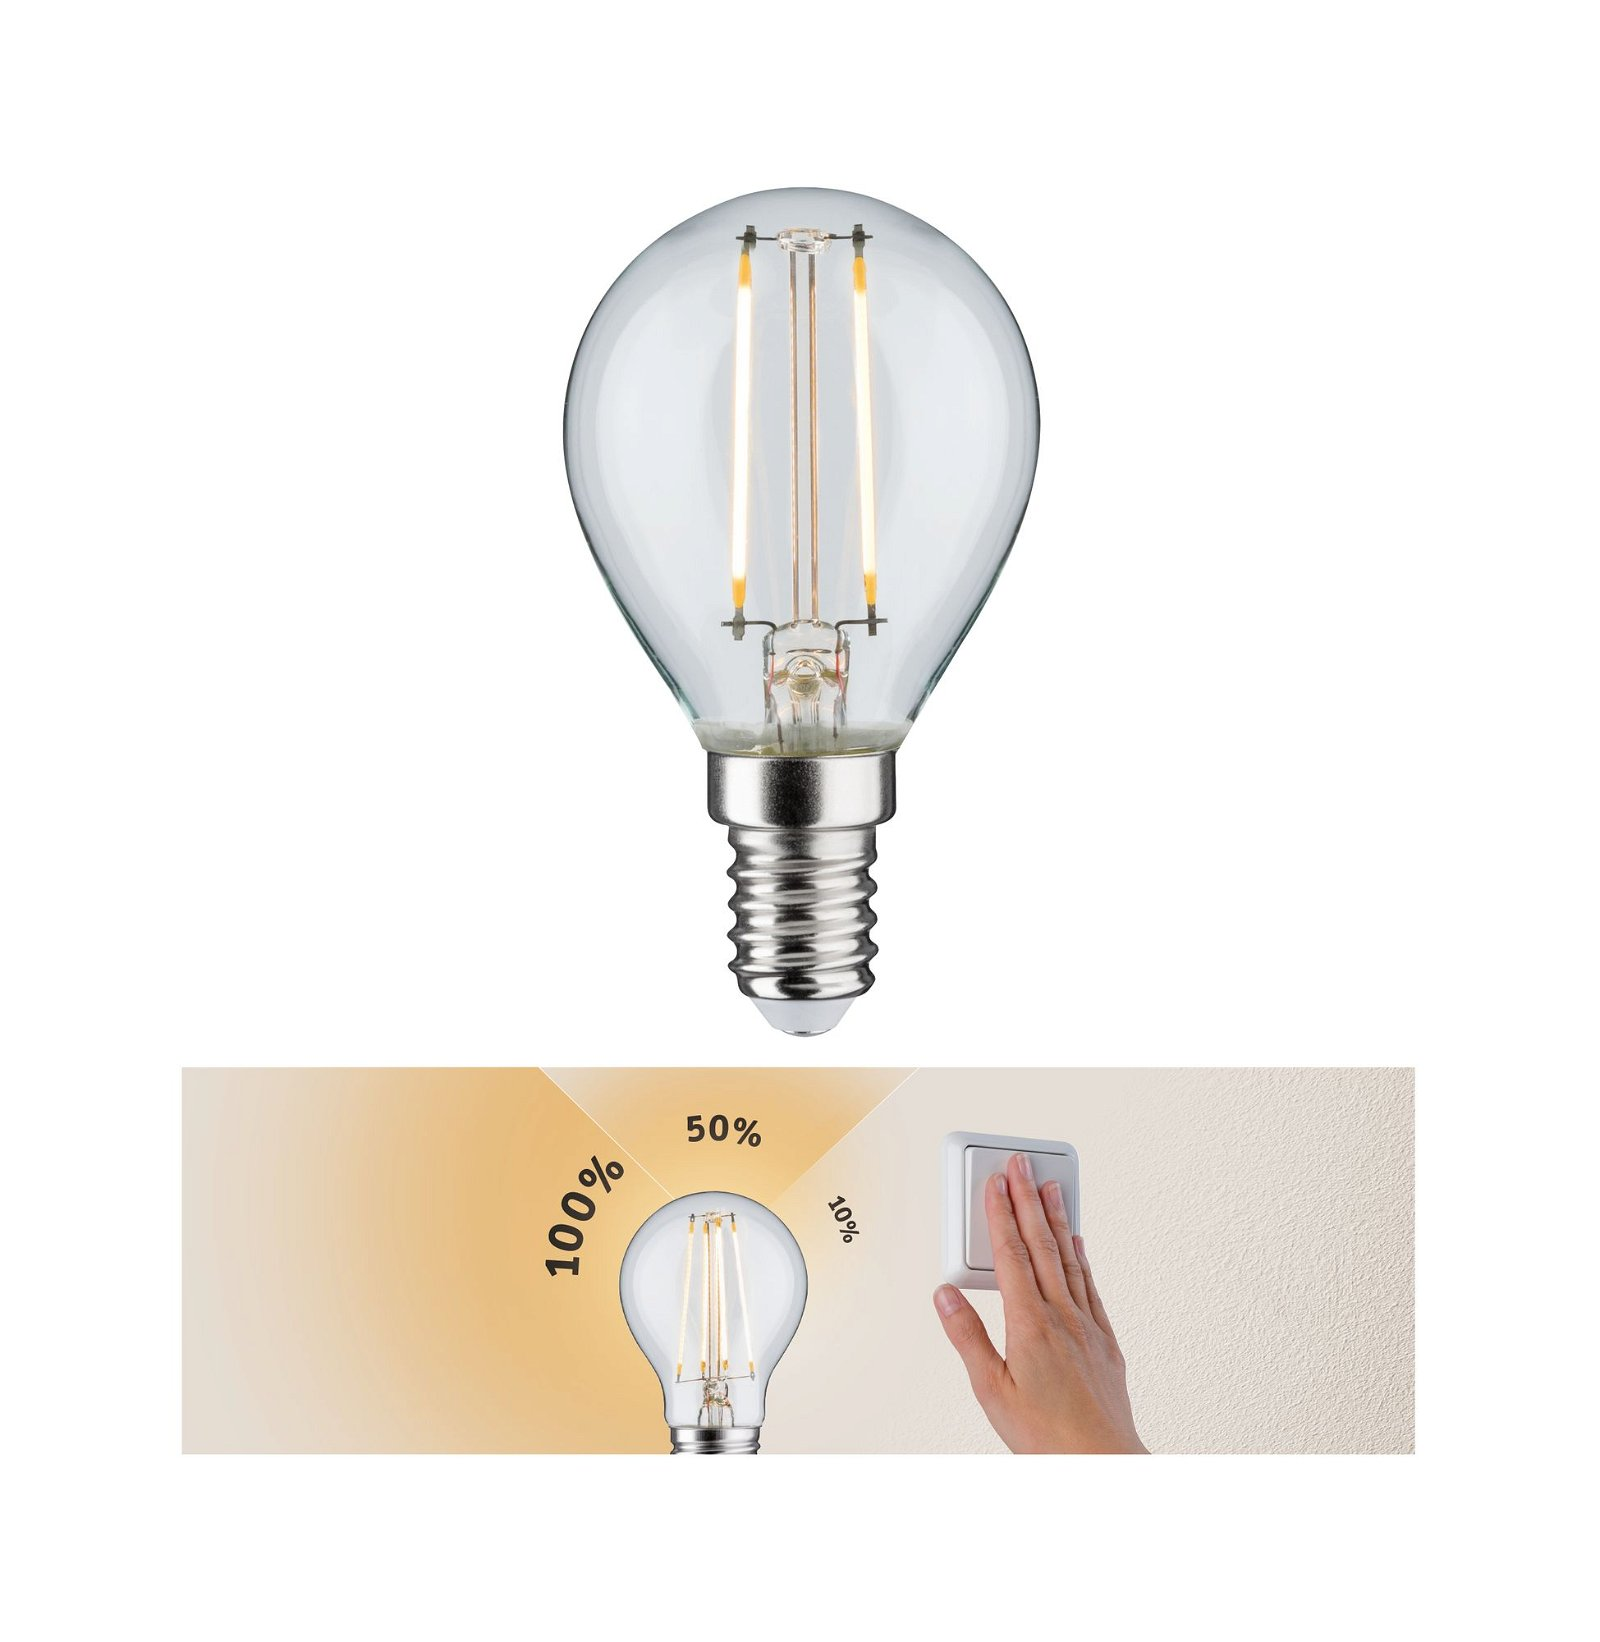 LED-kogellamp Filament E14 230V 250lm 2,5W 2700K Helder